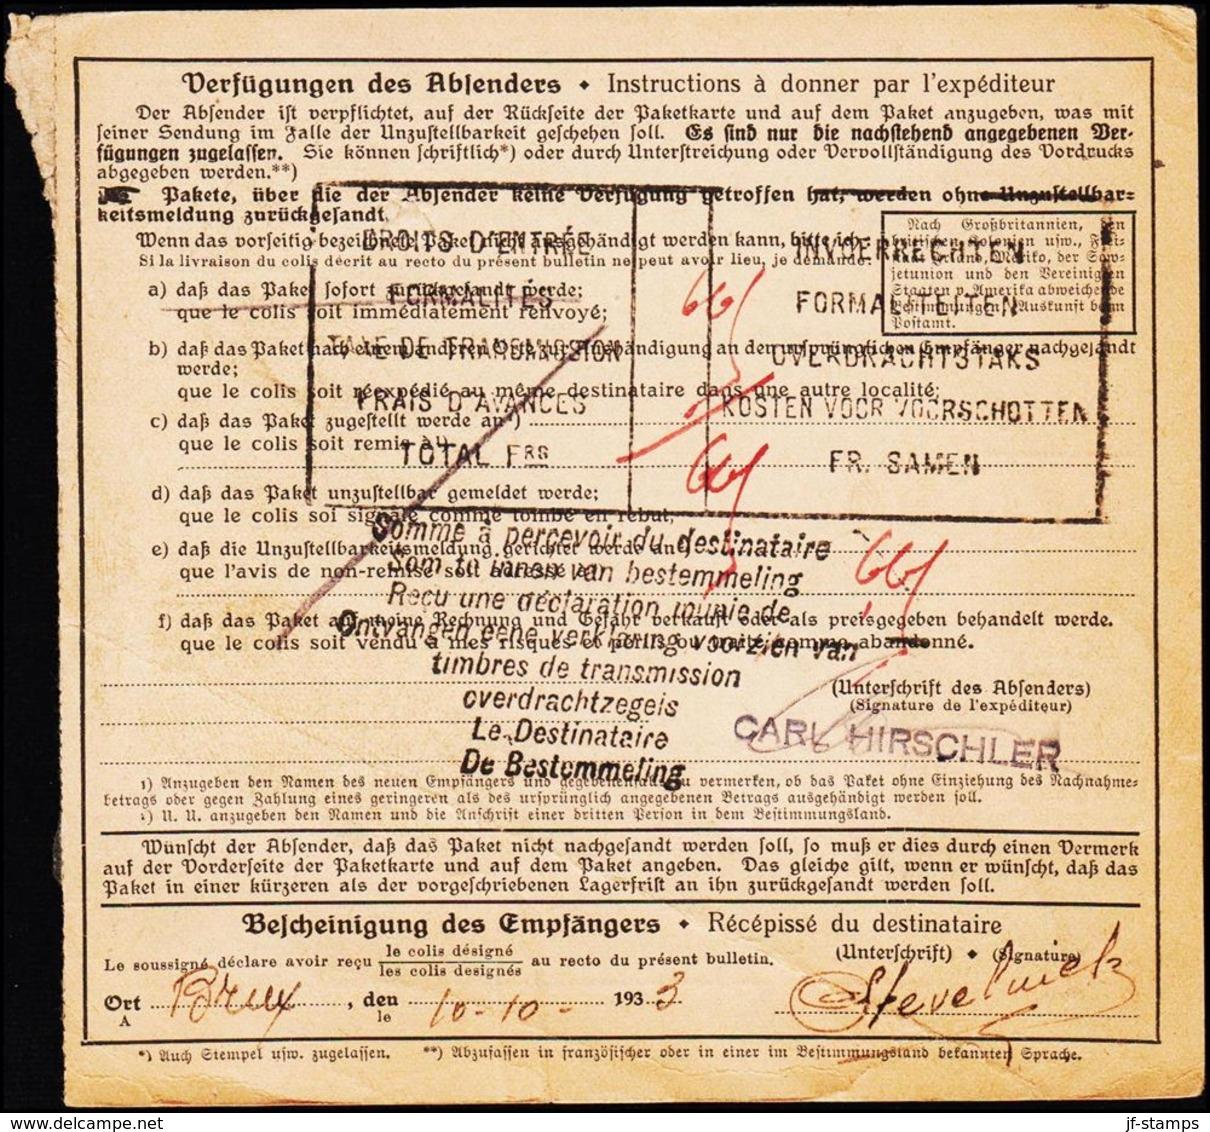 1933. PAKETKARTE 2 MARK + 50 + 15 PF. LUDWIGSHAFEN 4.10.39. BRUXELLES 10.X.39. (Michel 365) - JF125725 - Deutschland